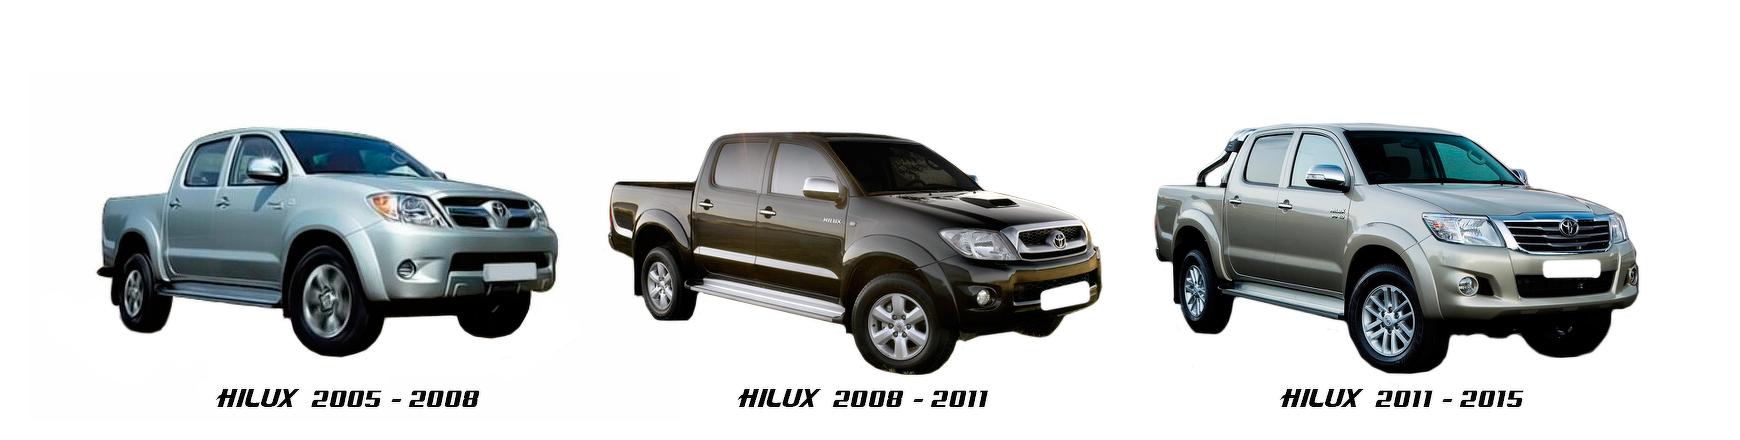 toyota hilux pick up 2004 2005 2006 2007 2008 2009 2010 2011